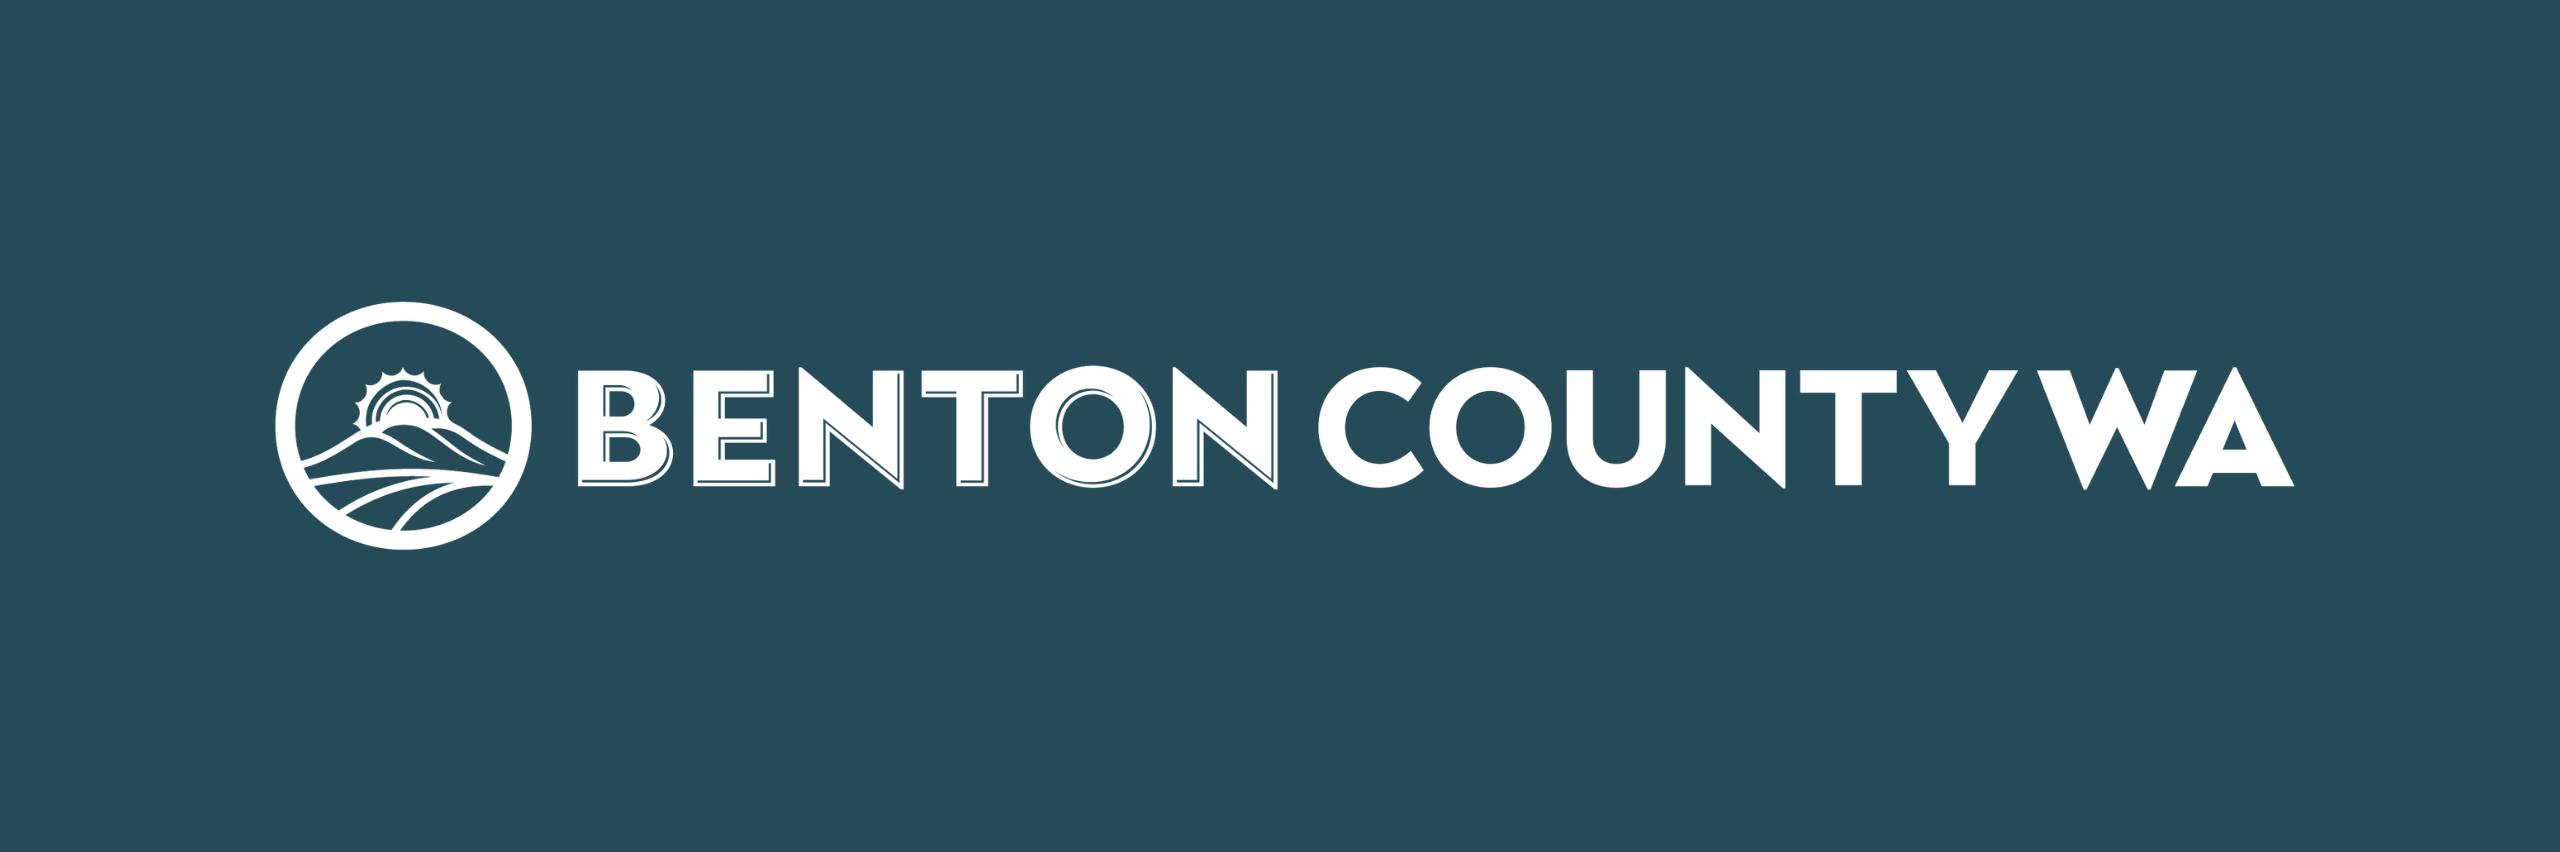 Benton County Planning Commission